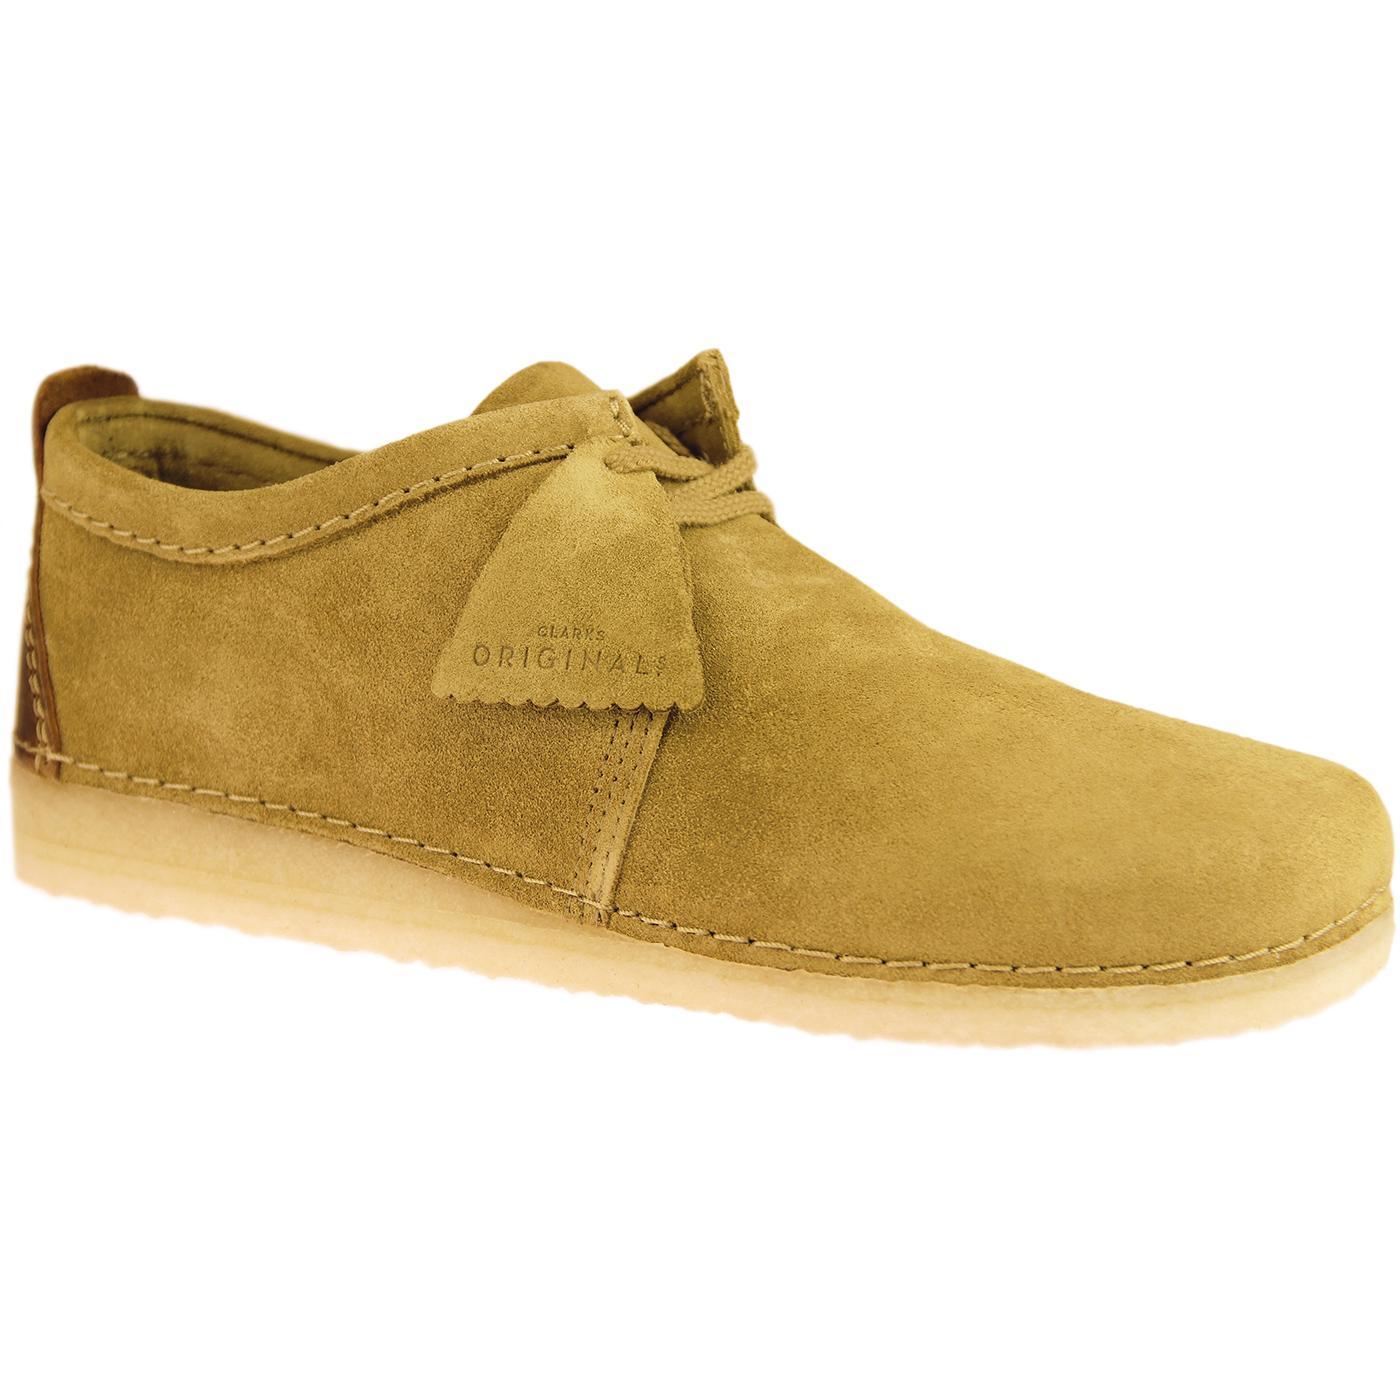 Ashton CLARKS ORIGINALS Retro Mod Suede Shoes OAK